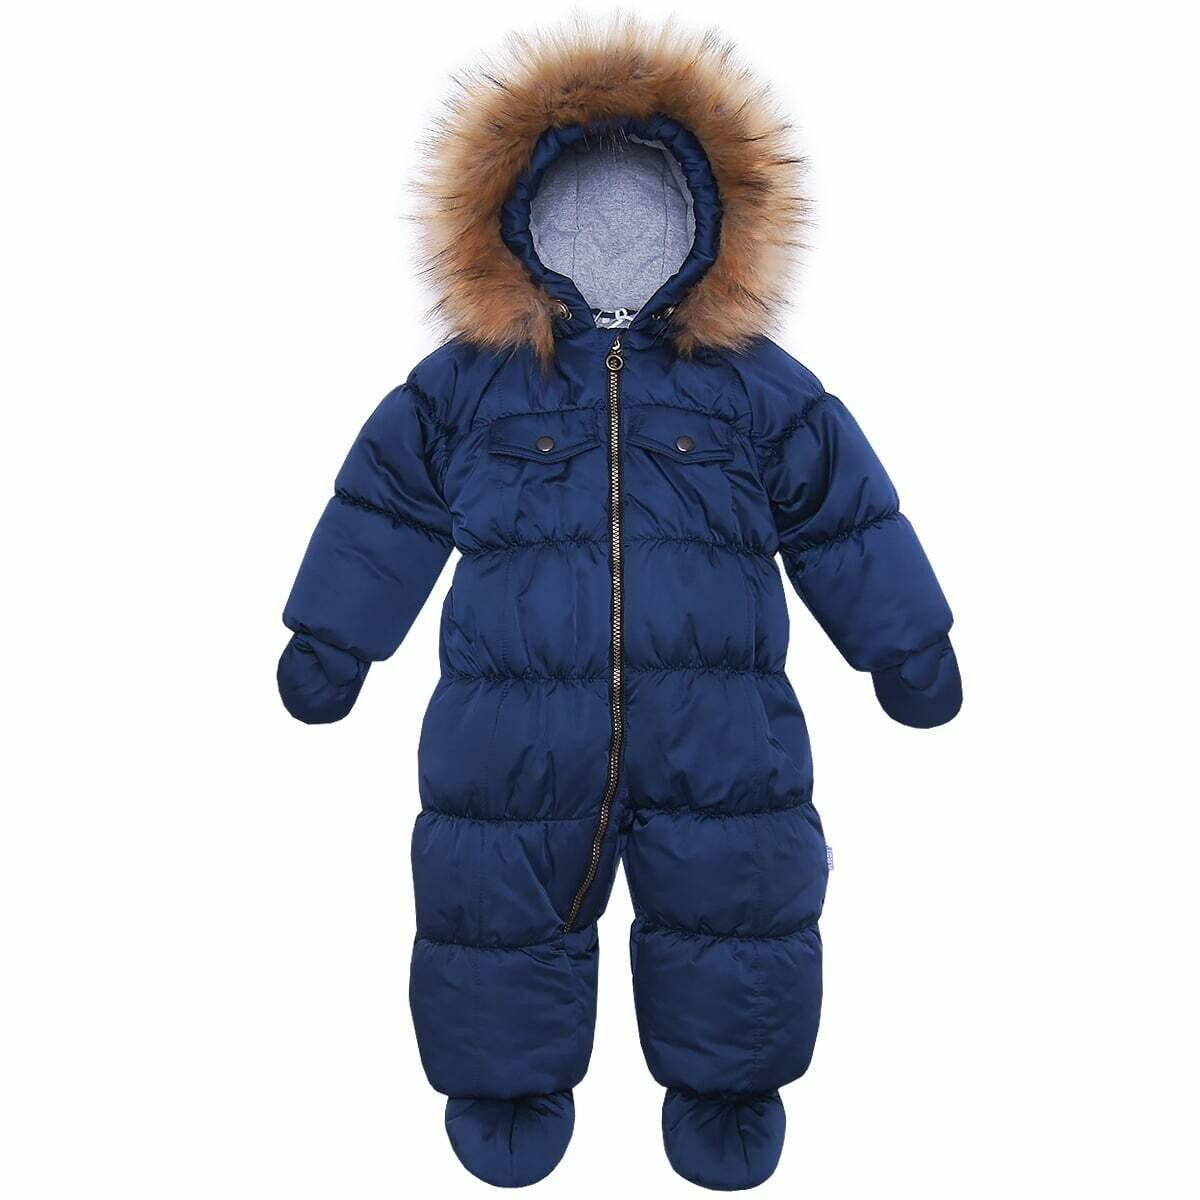 Комбинезон Аляска, зима, синий